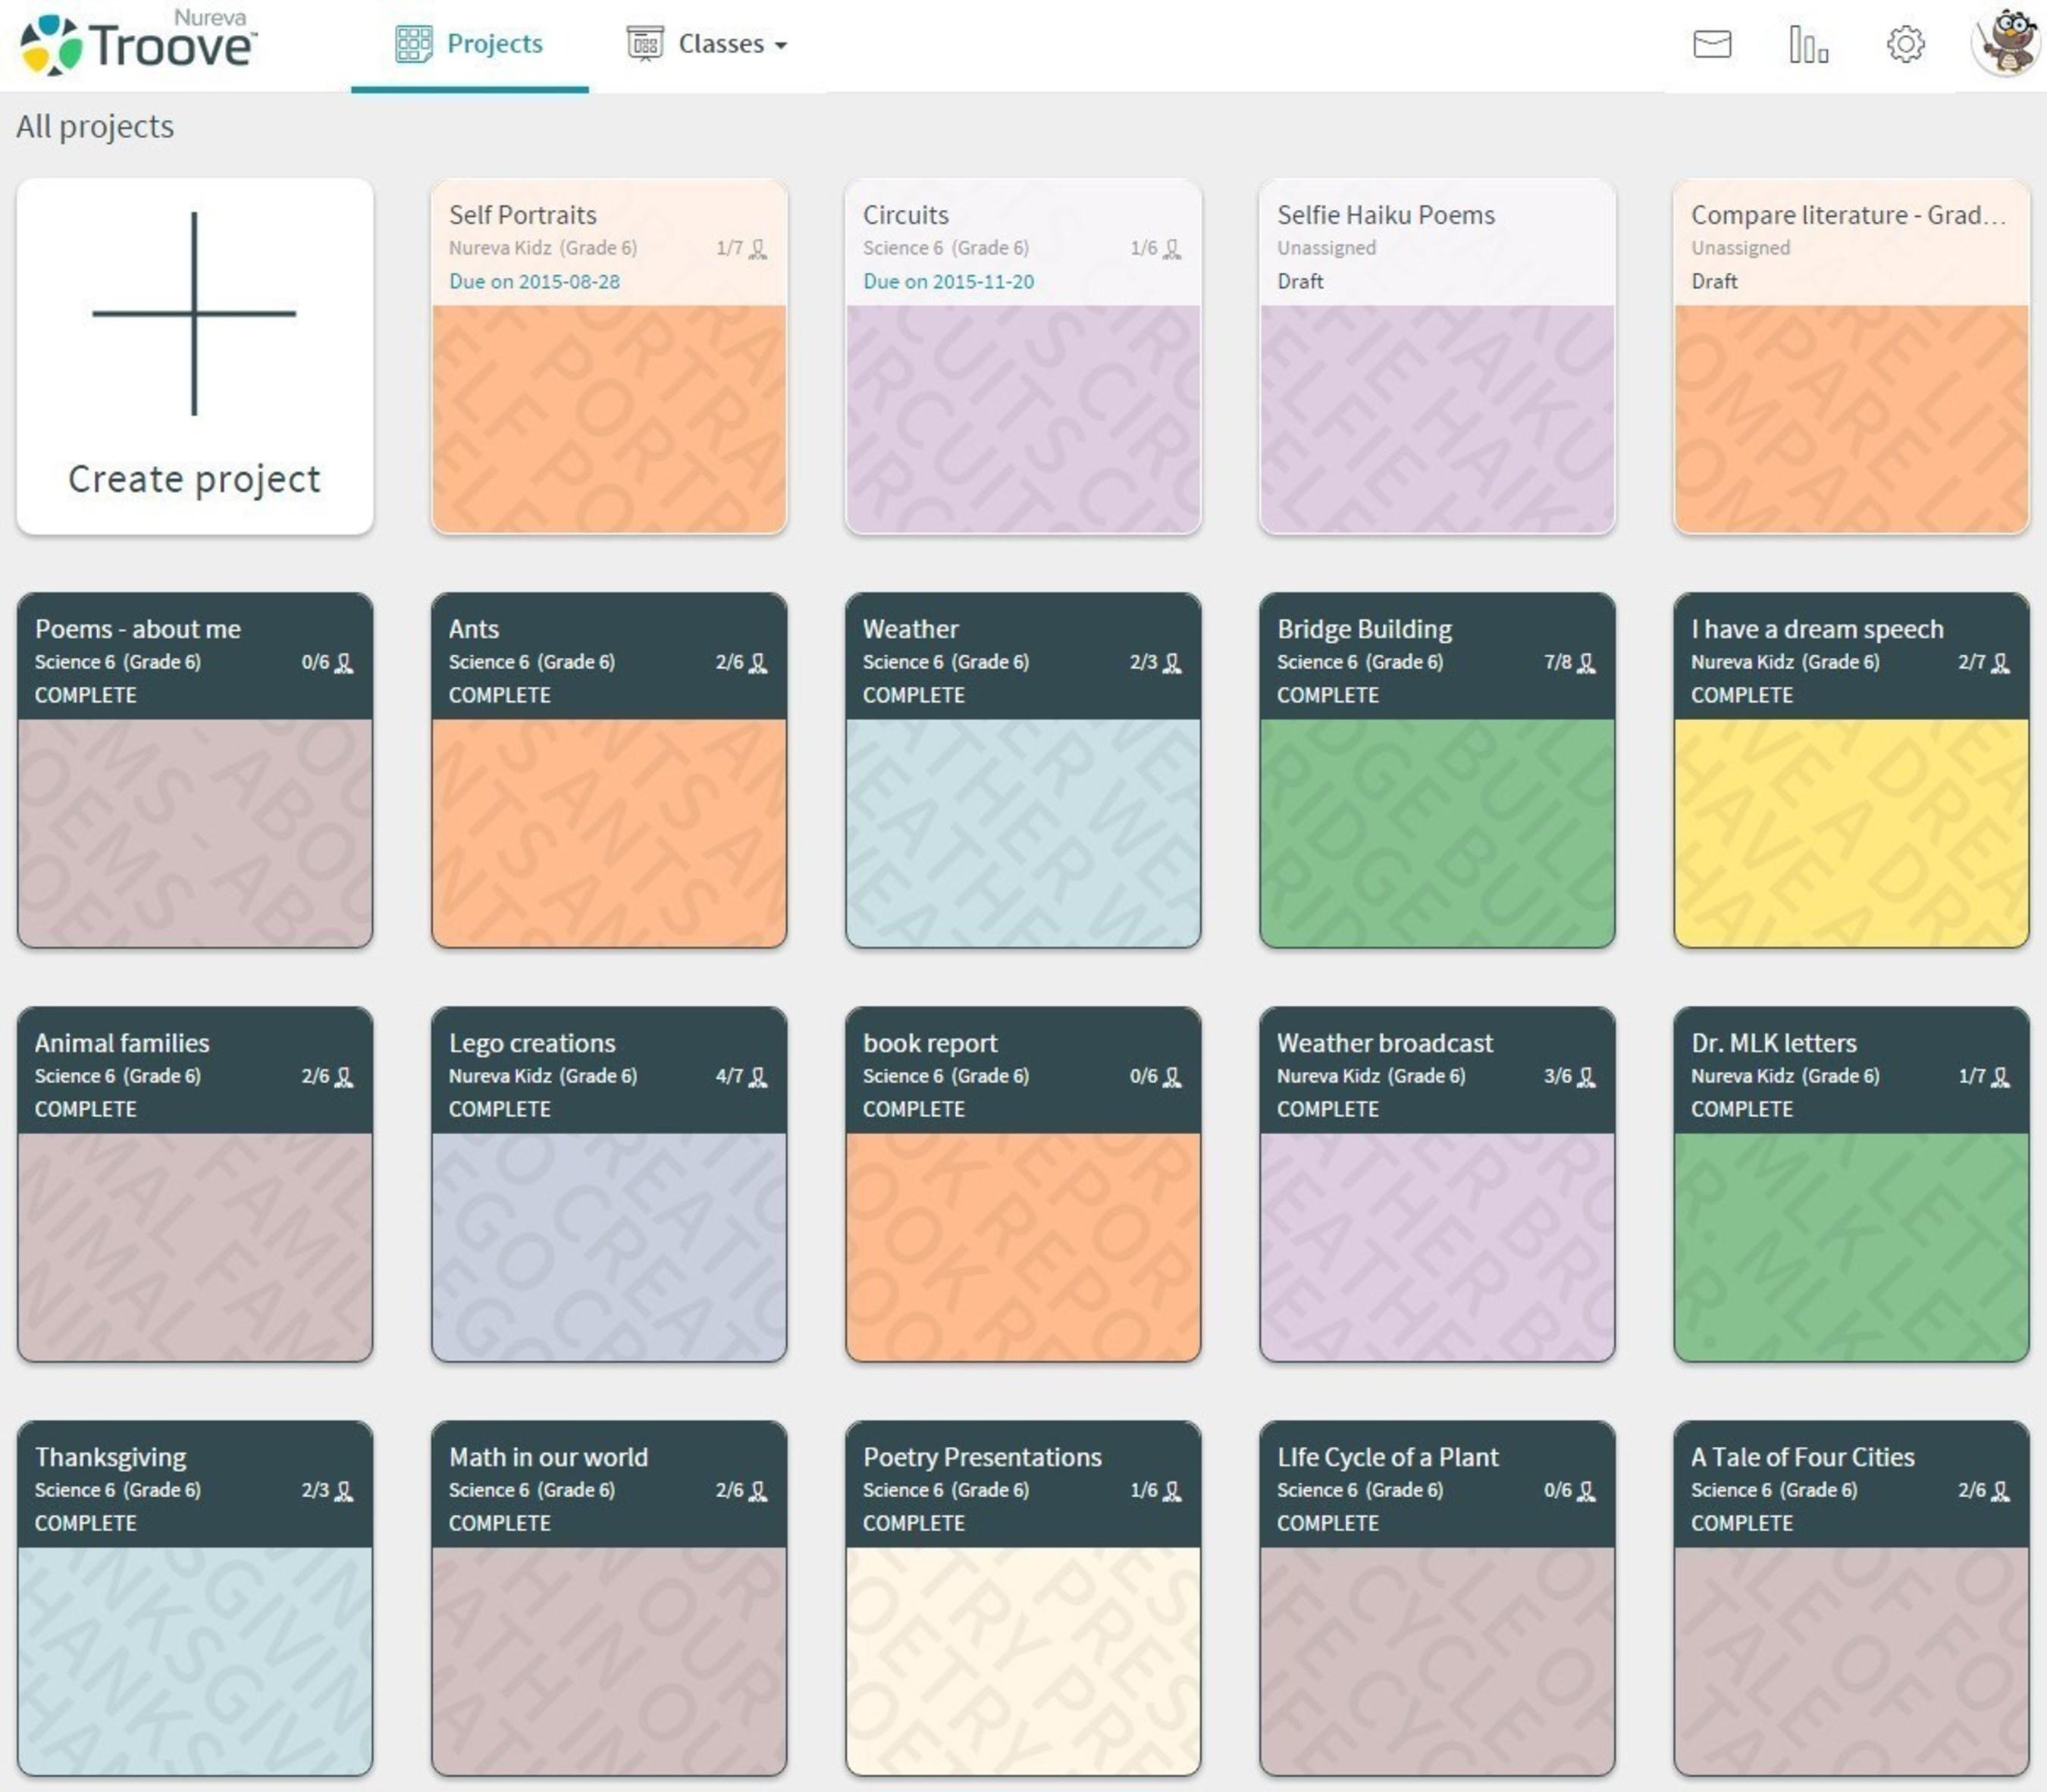 Nureva announces new release of Troove™ digital portfolio software